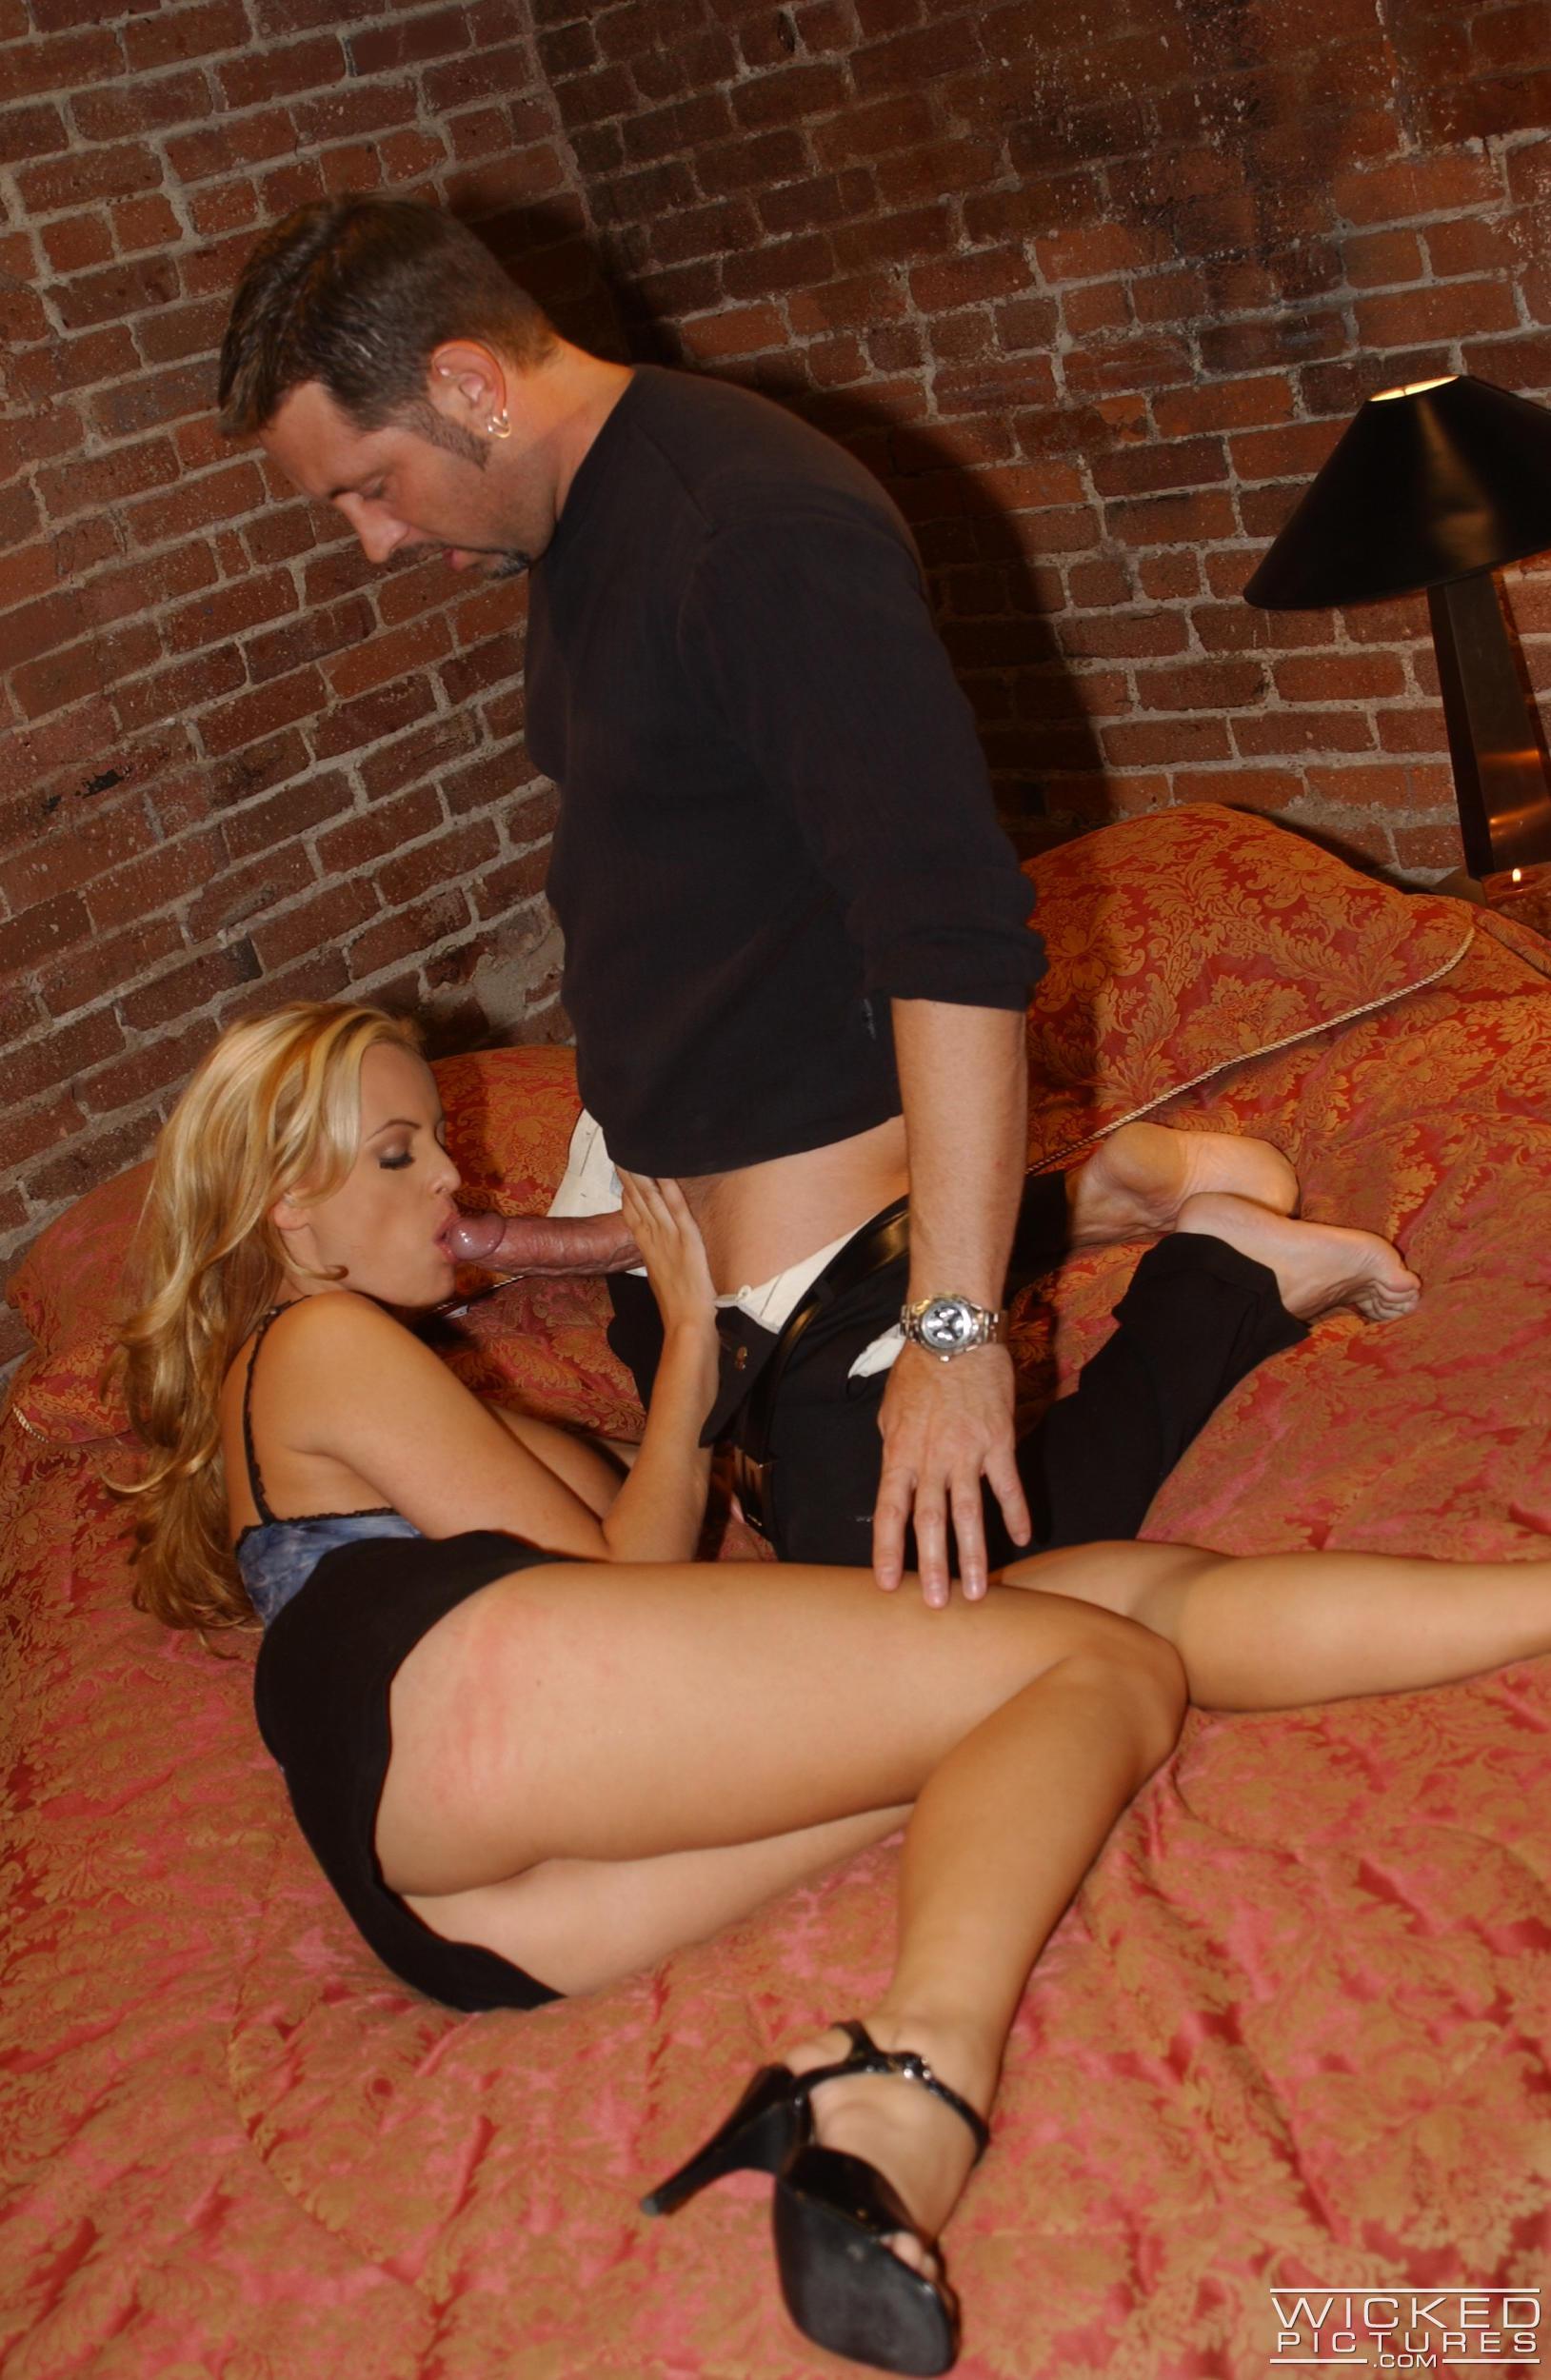 Wicked 'Not A Romance Scene 4' starring Stormy Daniels (Photo 12)